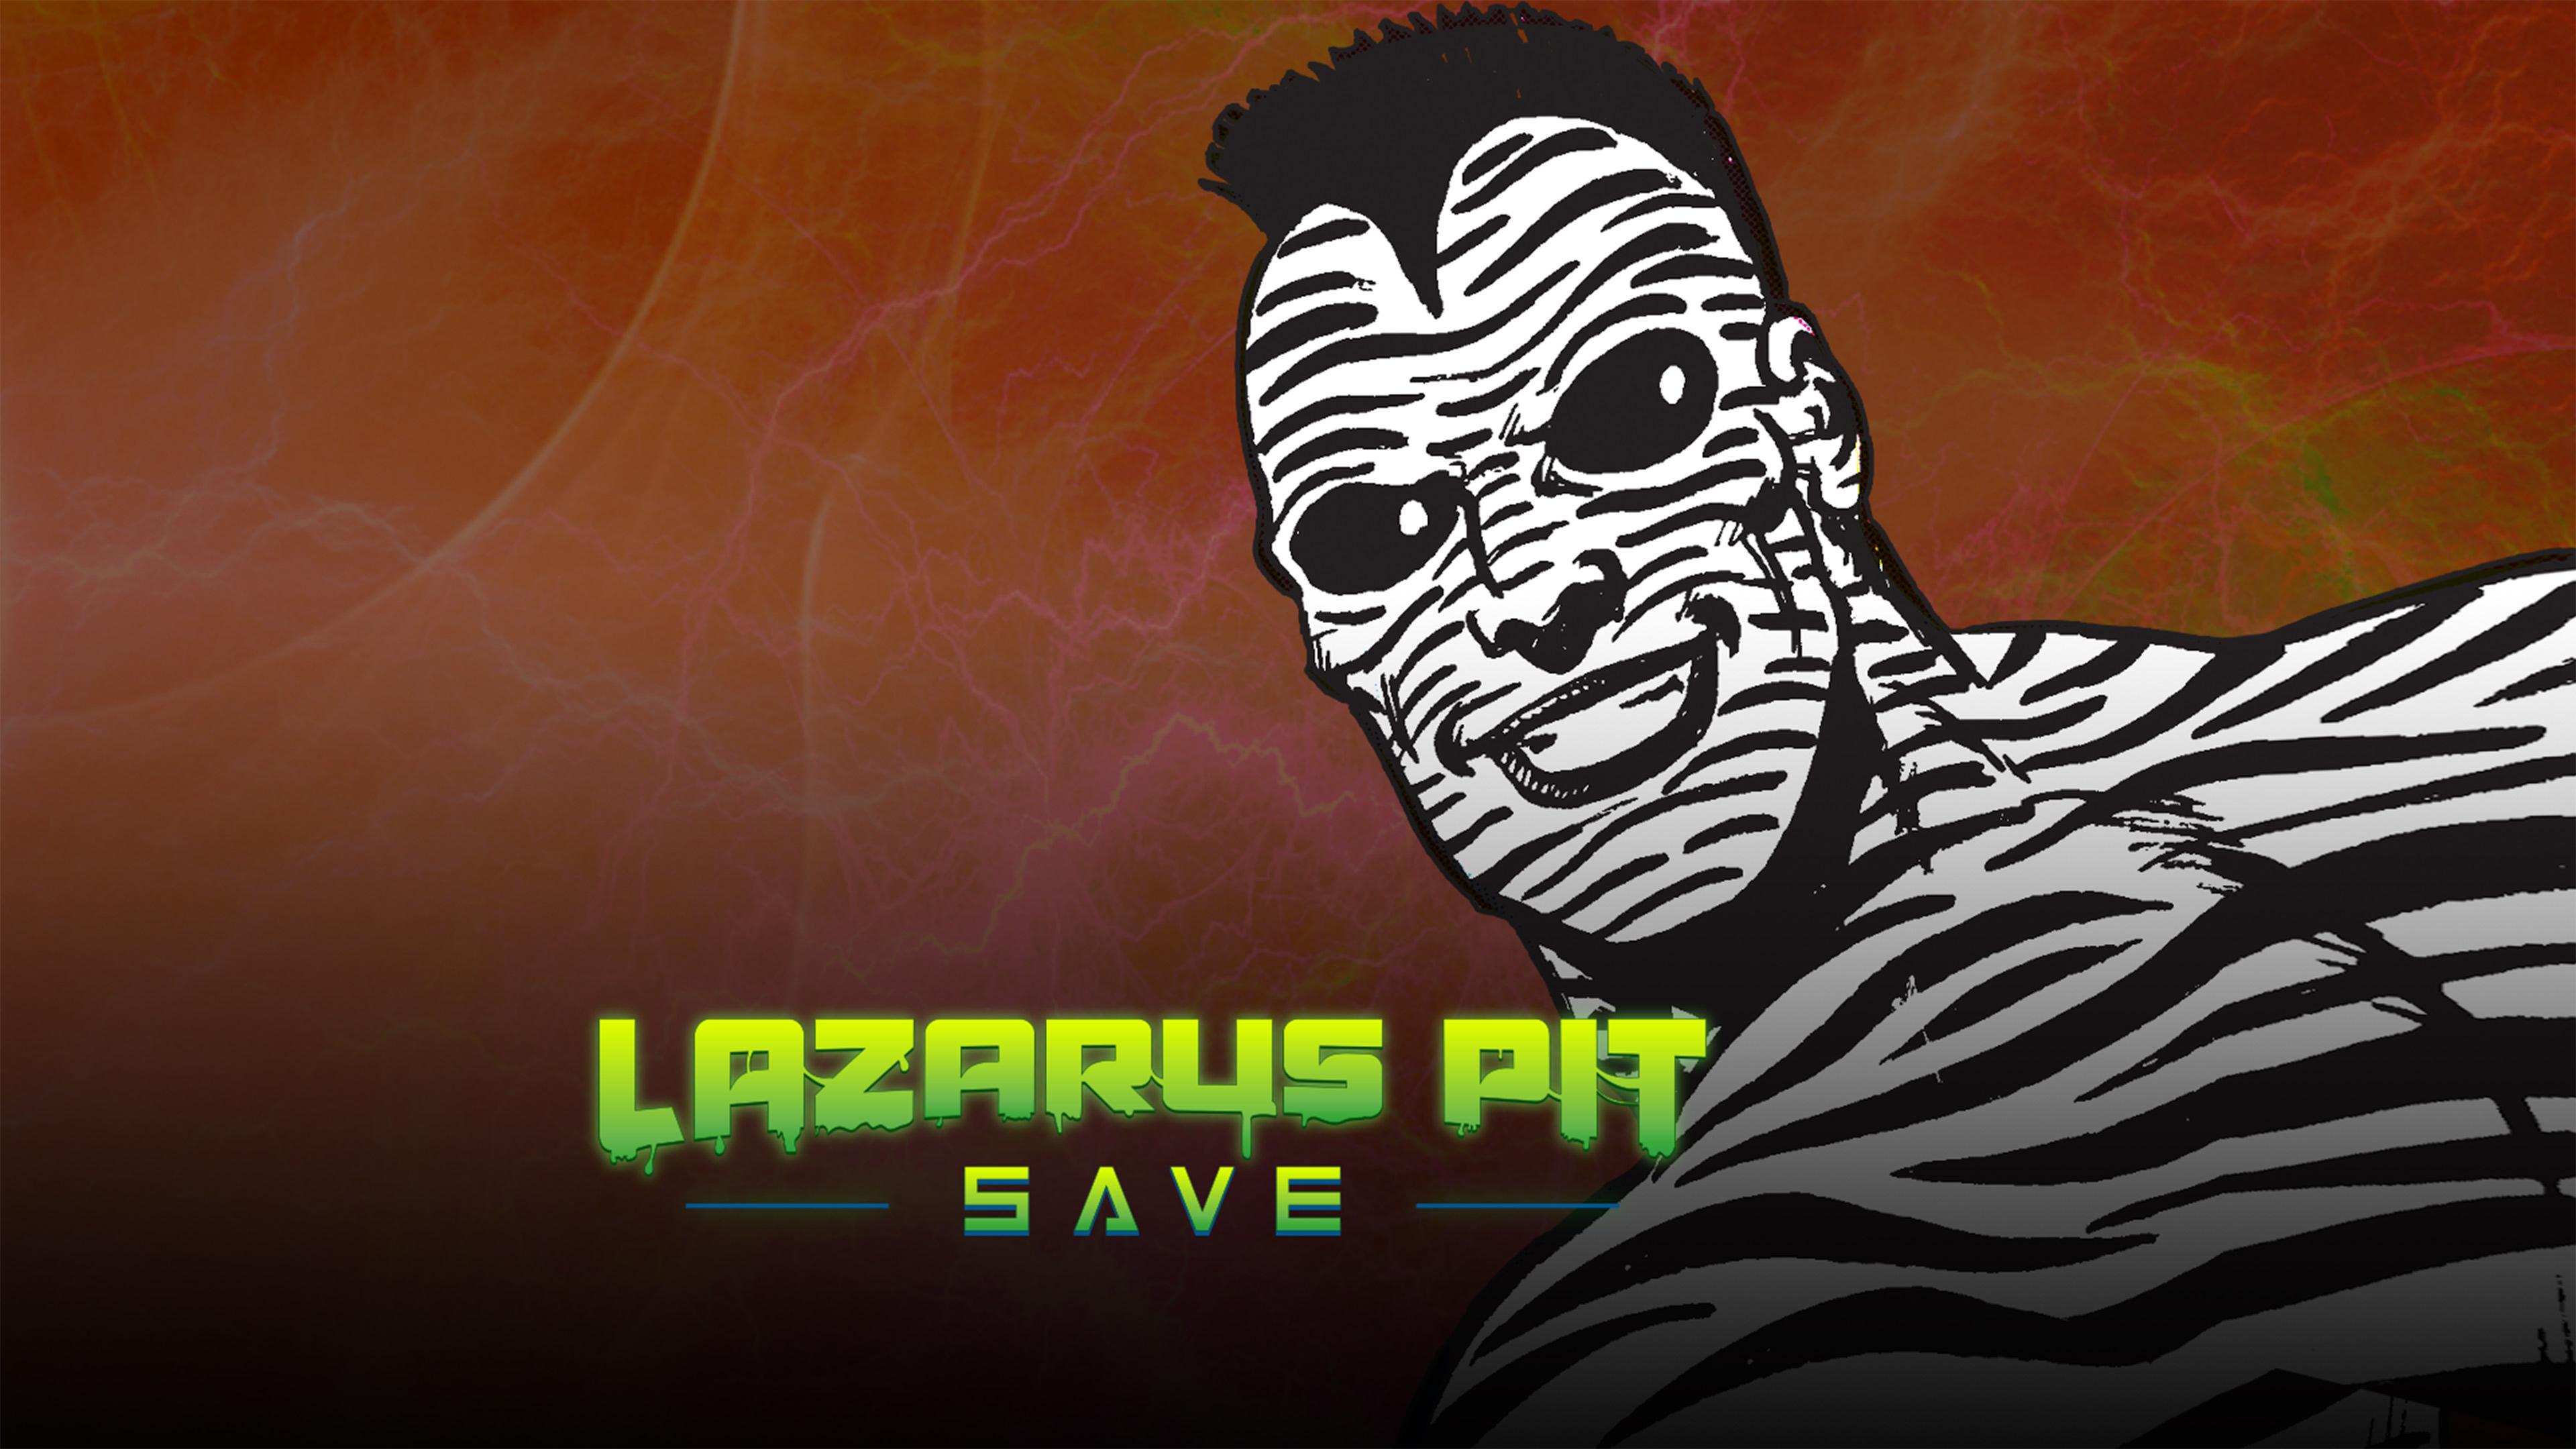 Zebraman lazarus pit save_metamadhouse_news_hero-c_v1_200327.jpg